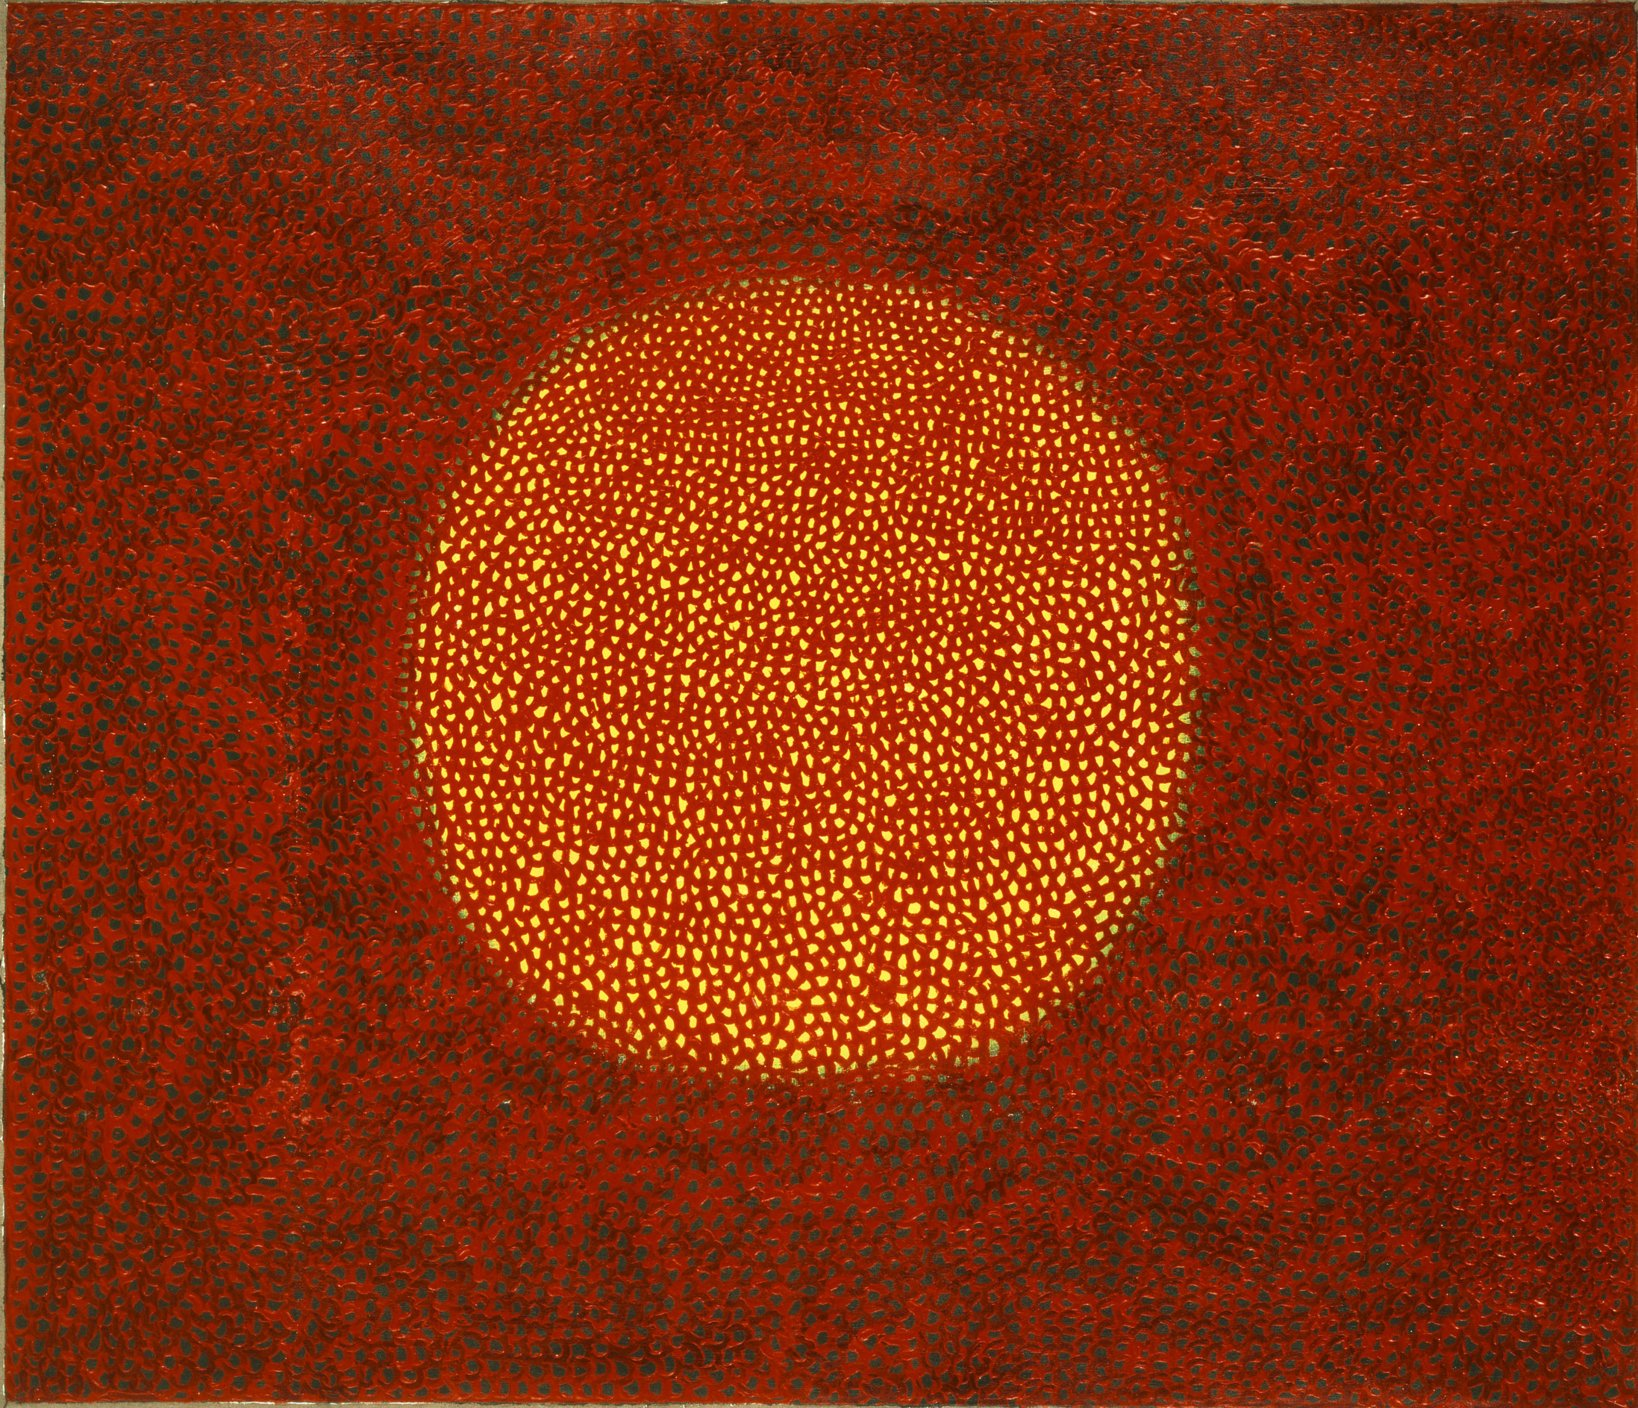 """Infinity Net"" 1965 Oil on canvas 132cm×152cm (c) YAYOI KUSAMA"